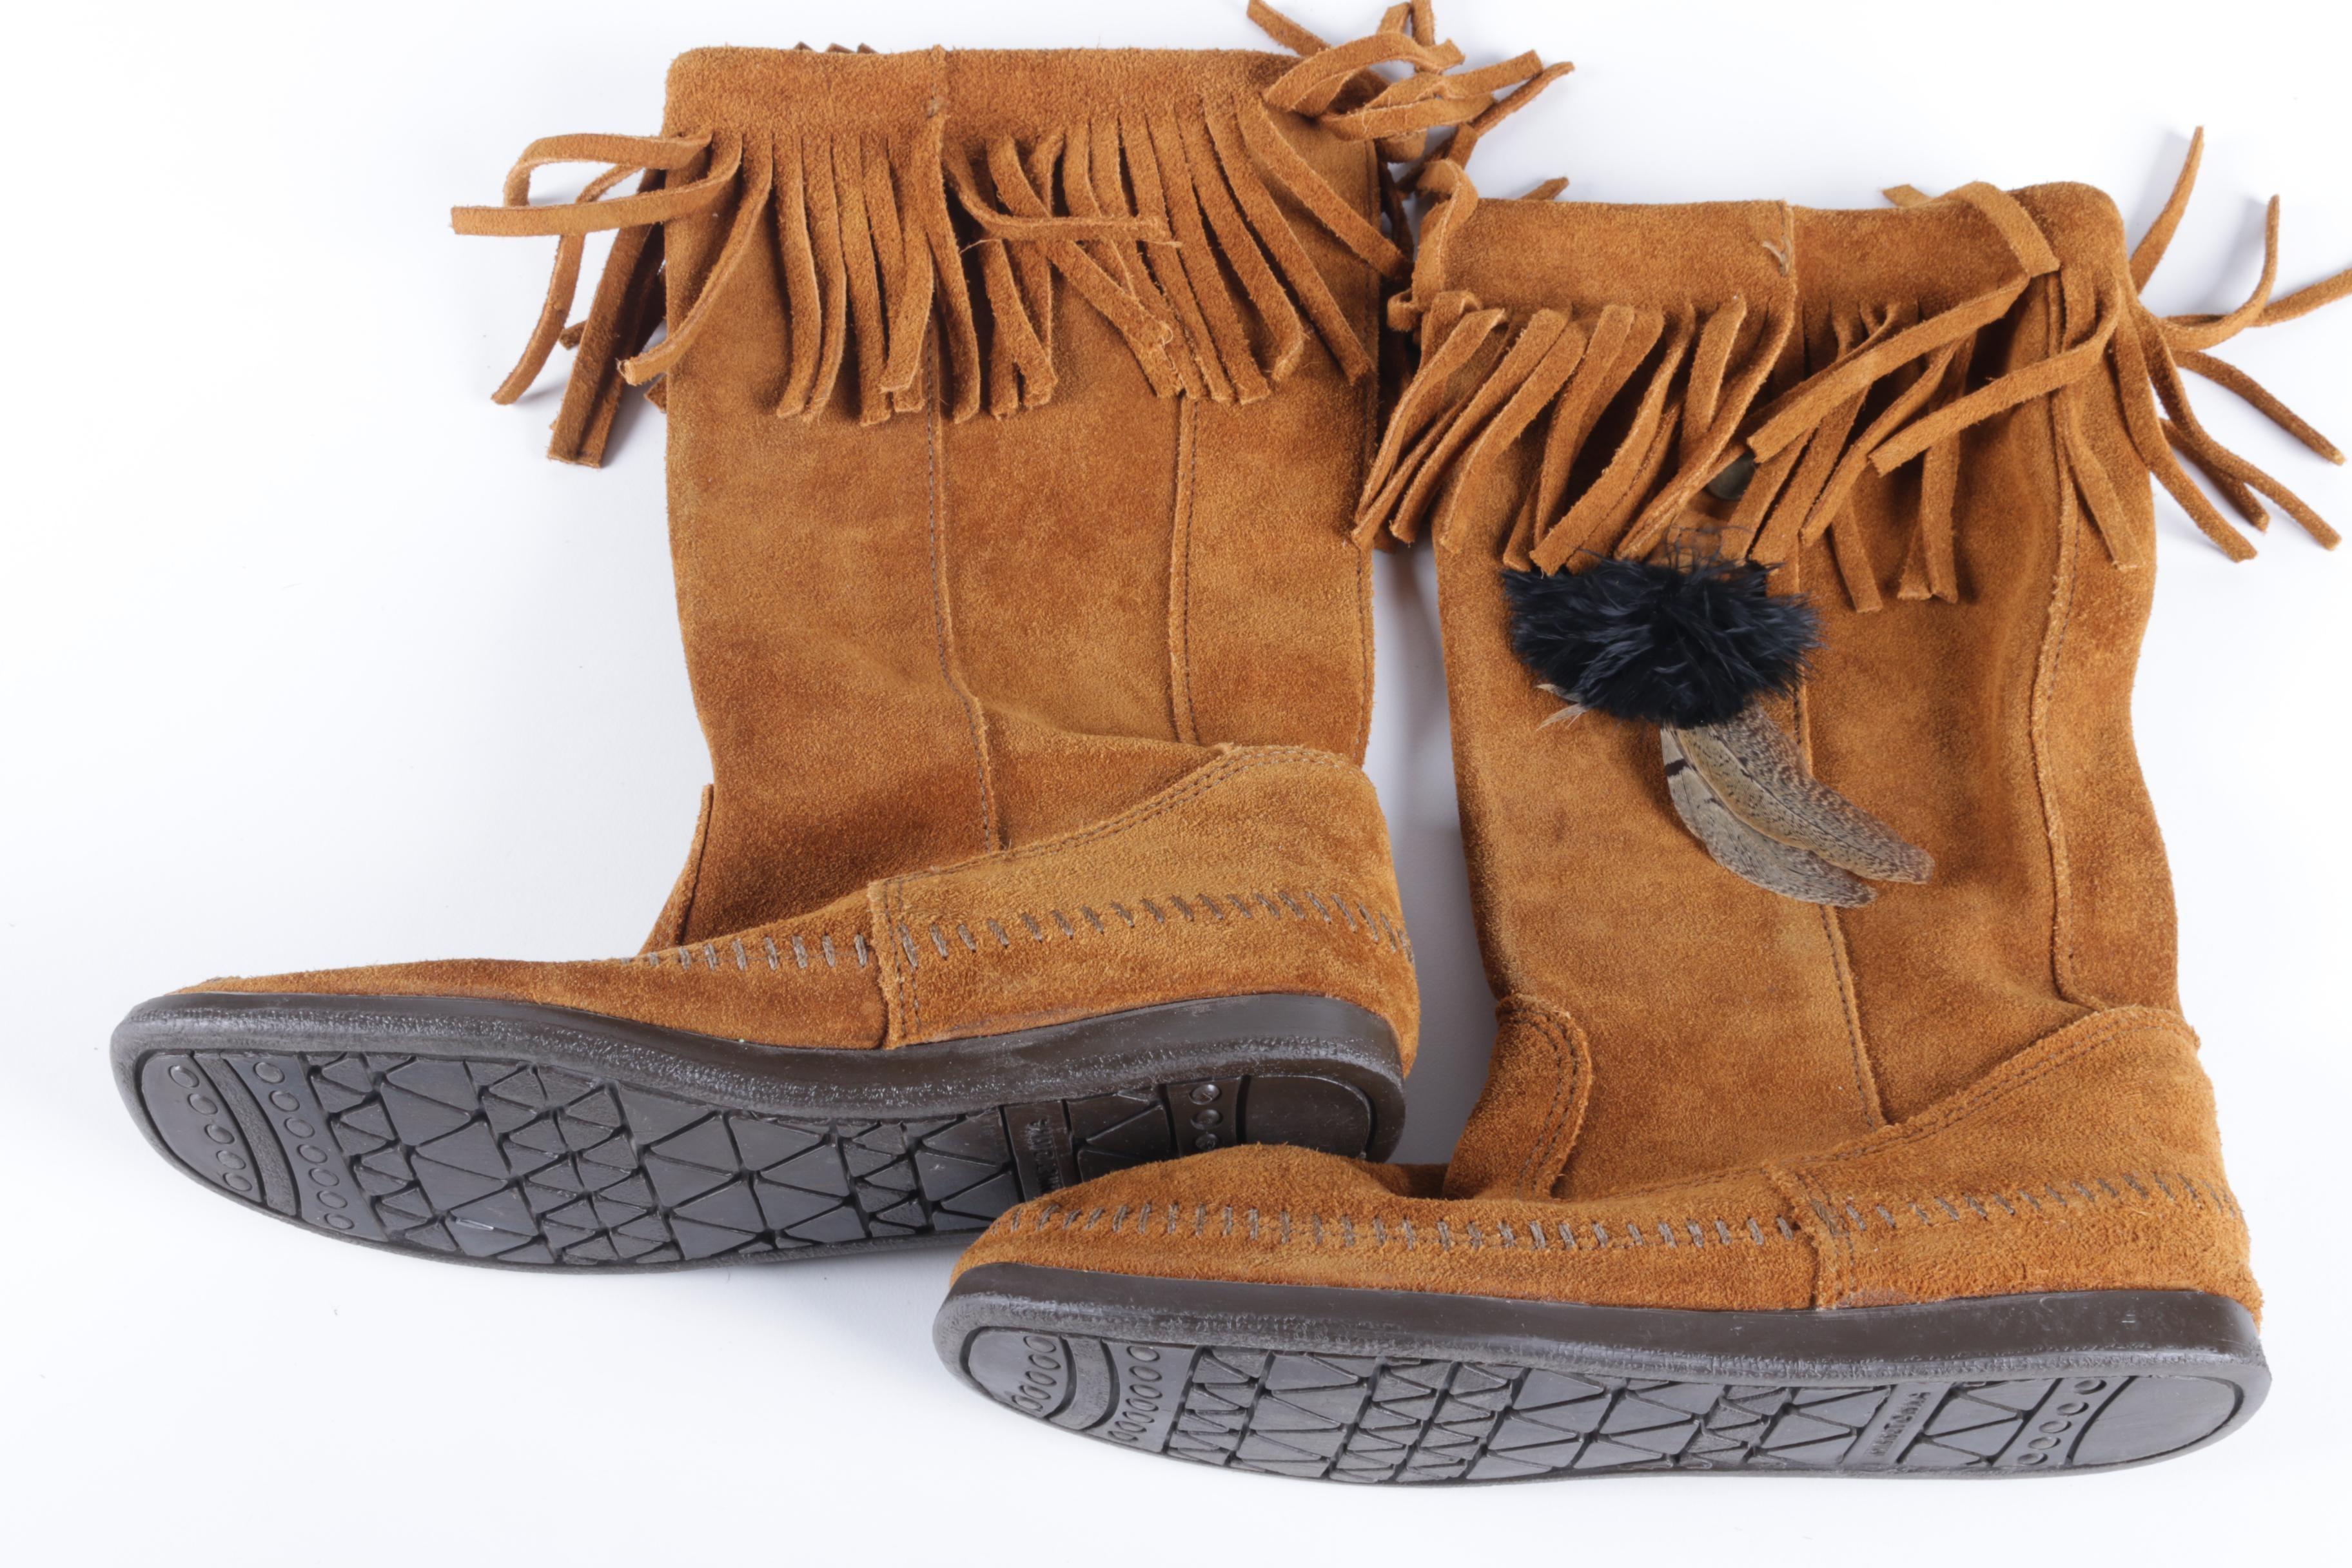 Minnetonka Moccasin Boots